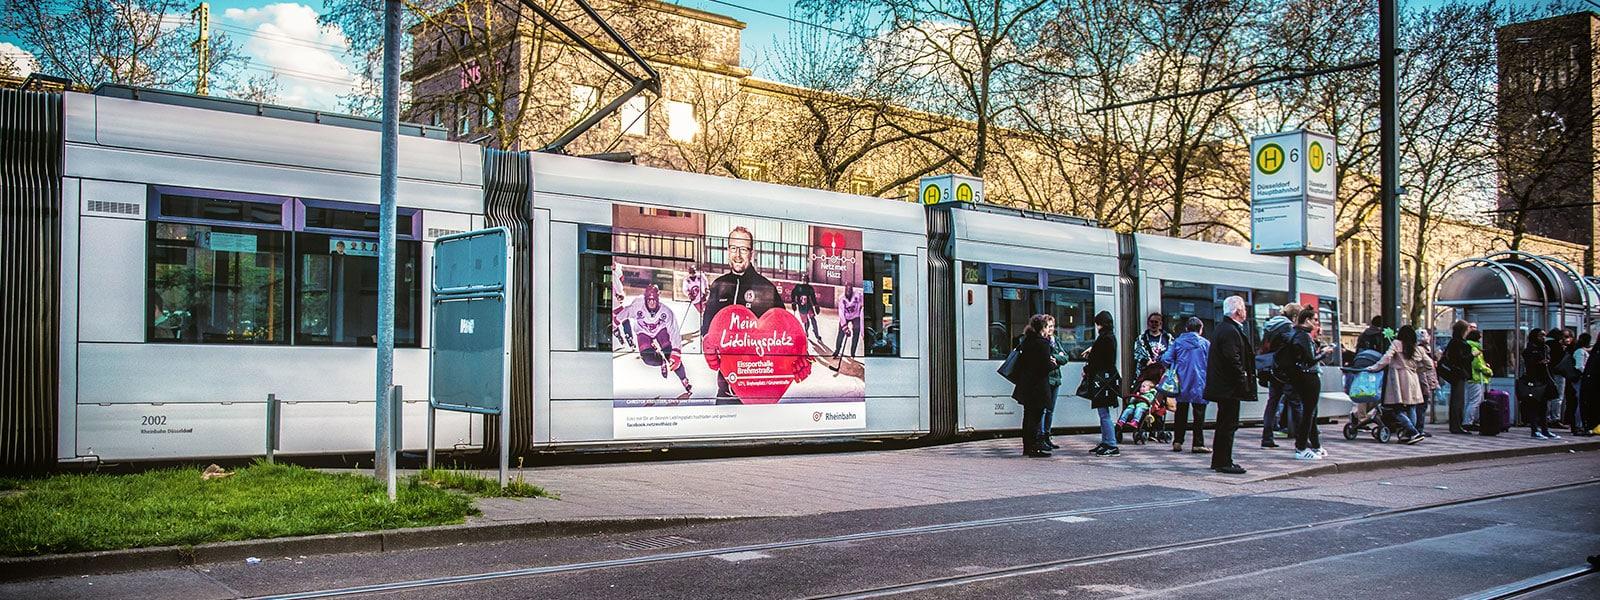 Bremen-Verkehrsmittelwerbung-Bahn-Traffic-Board